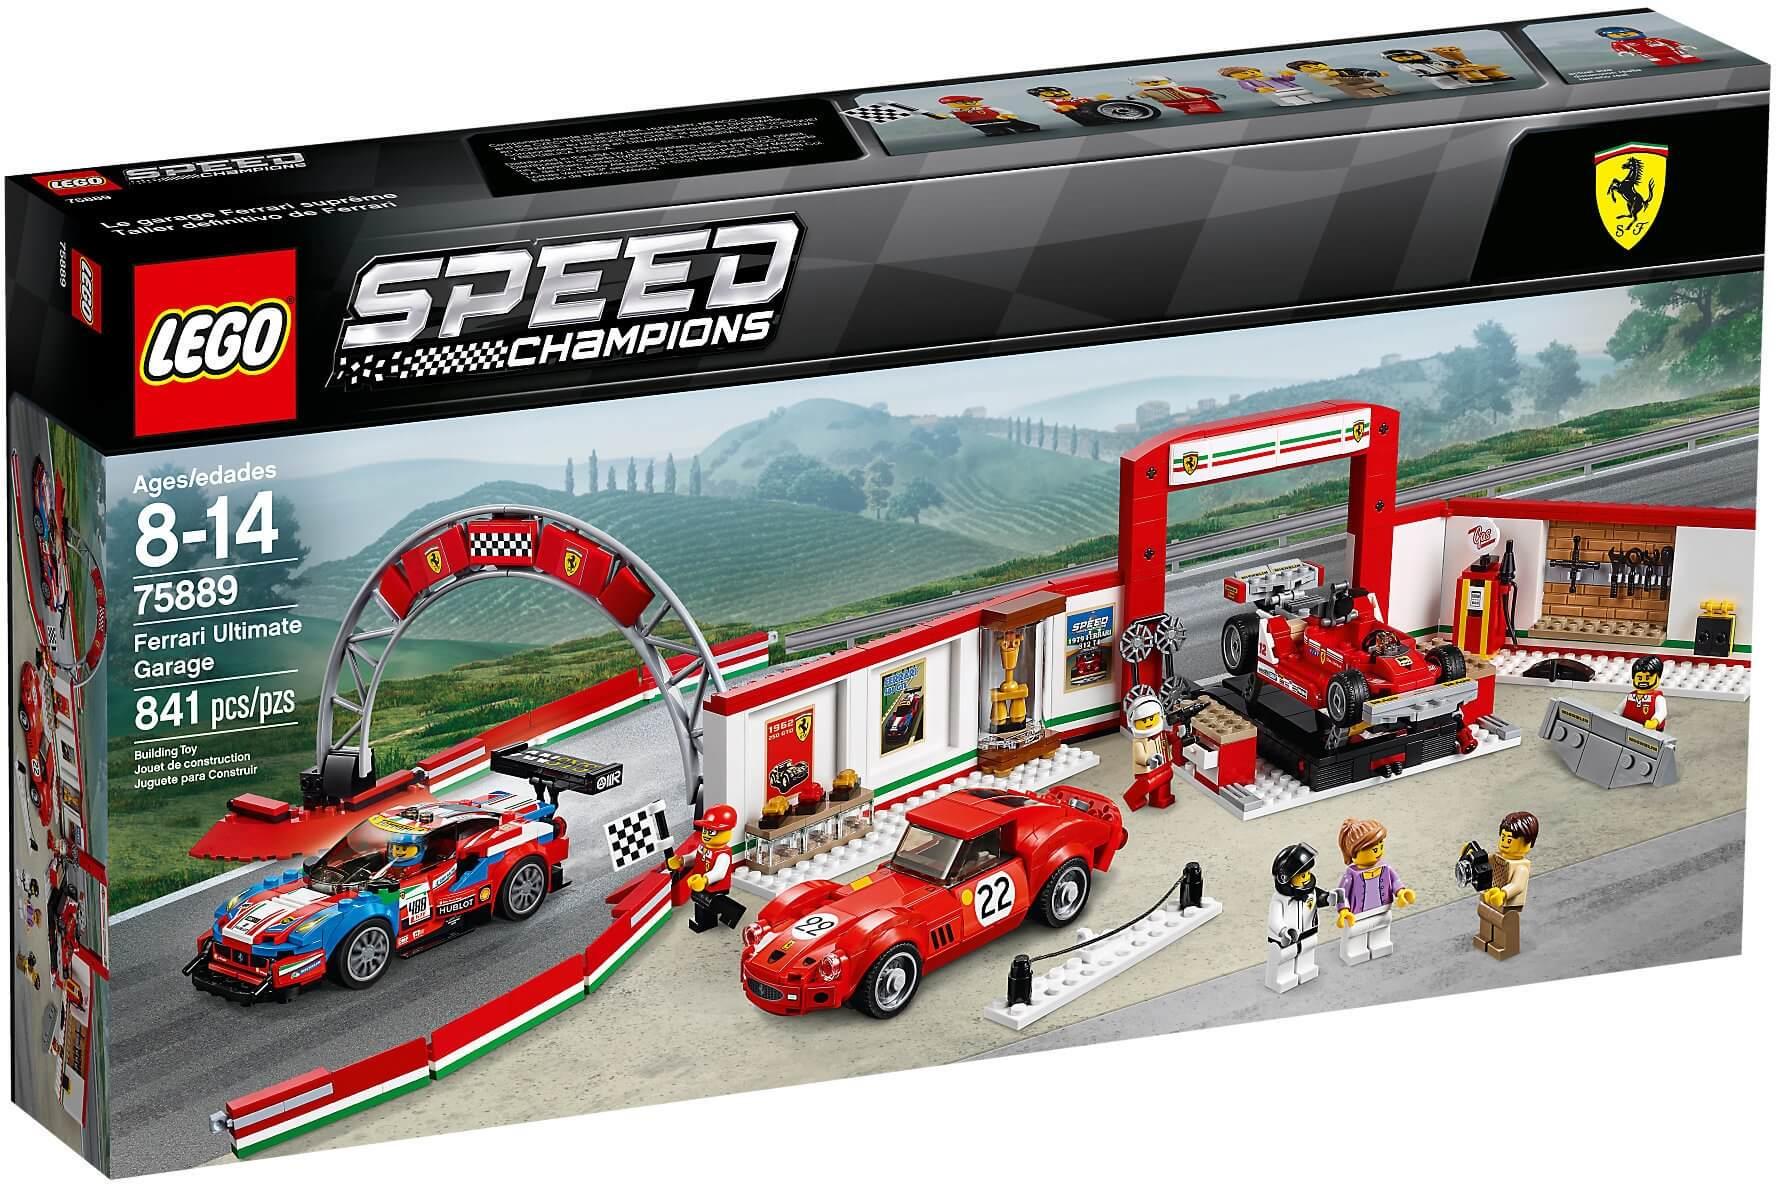 Mua đồ chơi LEGO 75889 - LEGO Speed Champion 75889 - Đội Xe Đua Ferrari (LEGO Speed Champion 75889 Ferrari Ultimate Garage)